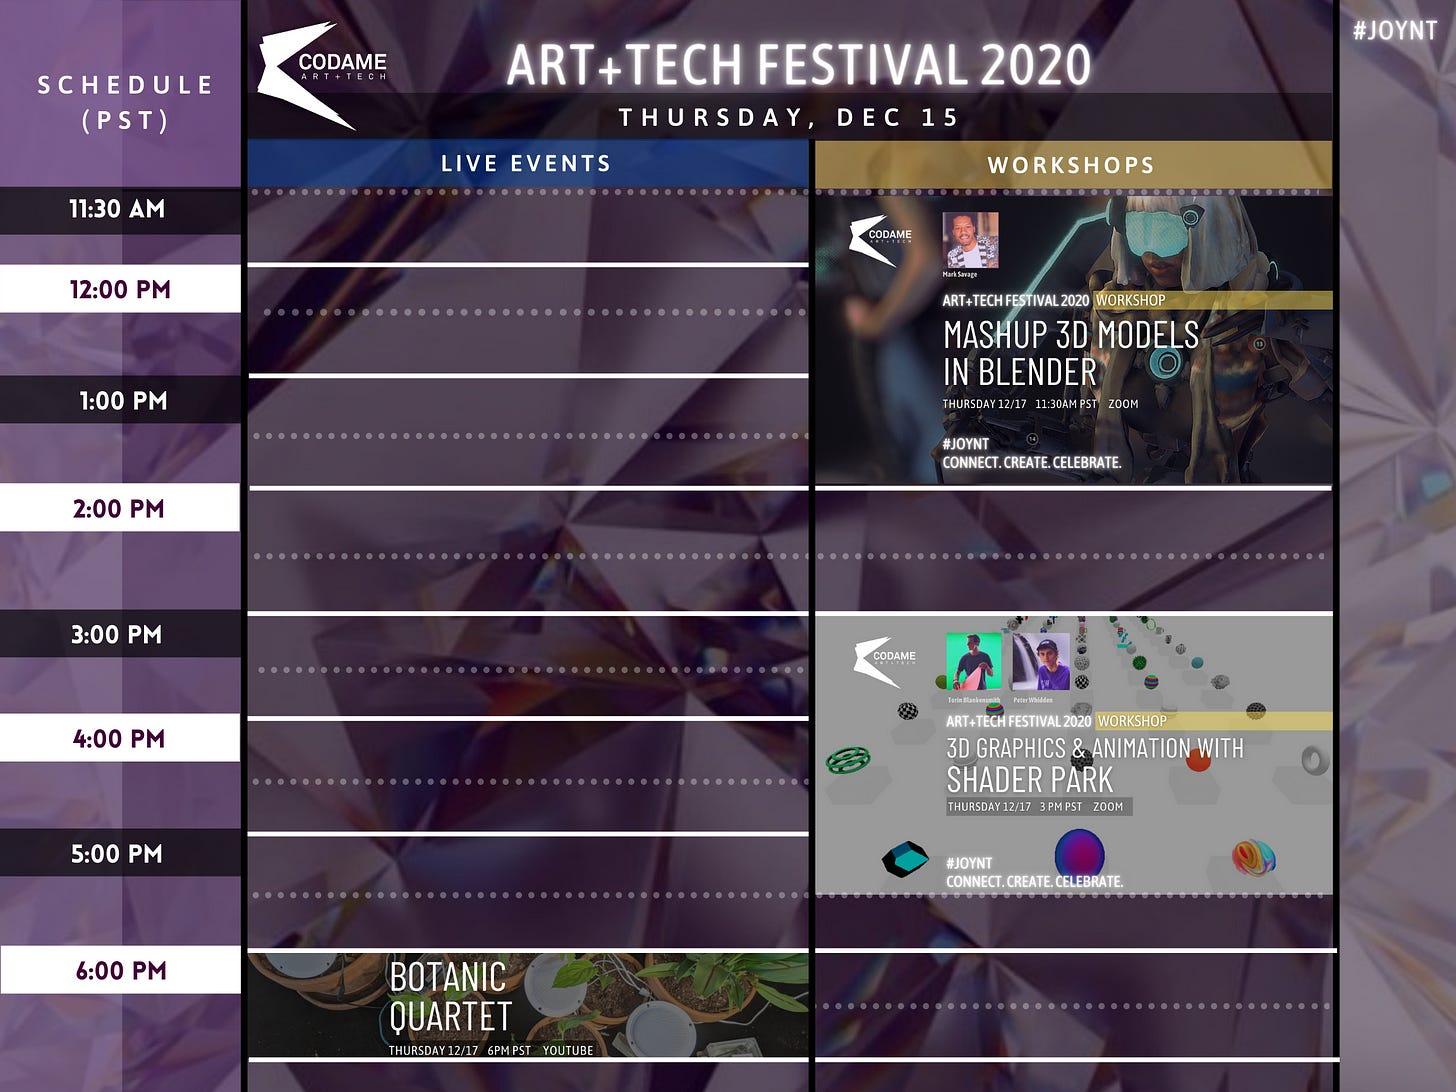 DAY 7: ART+TECH Festival 2020『 JOYNT 』